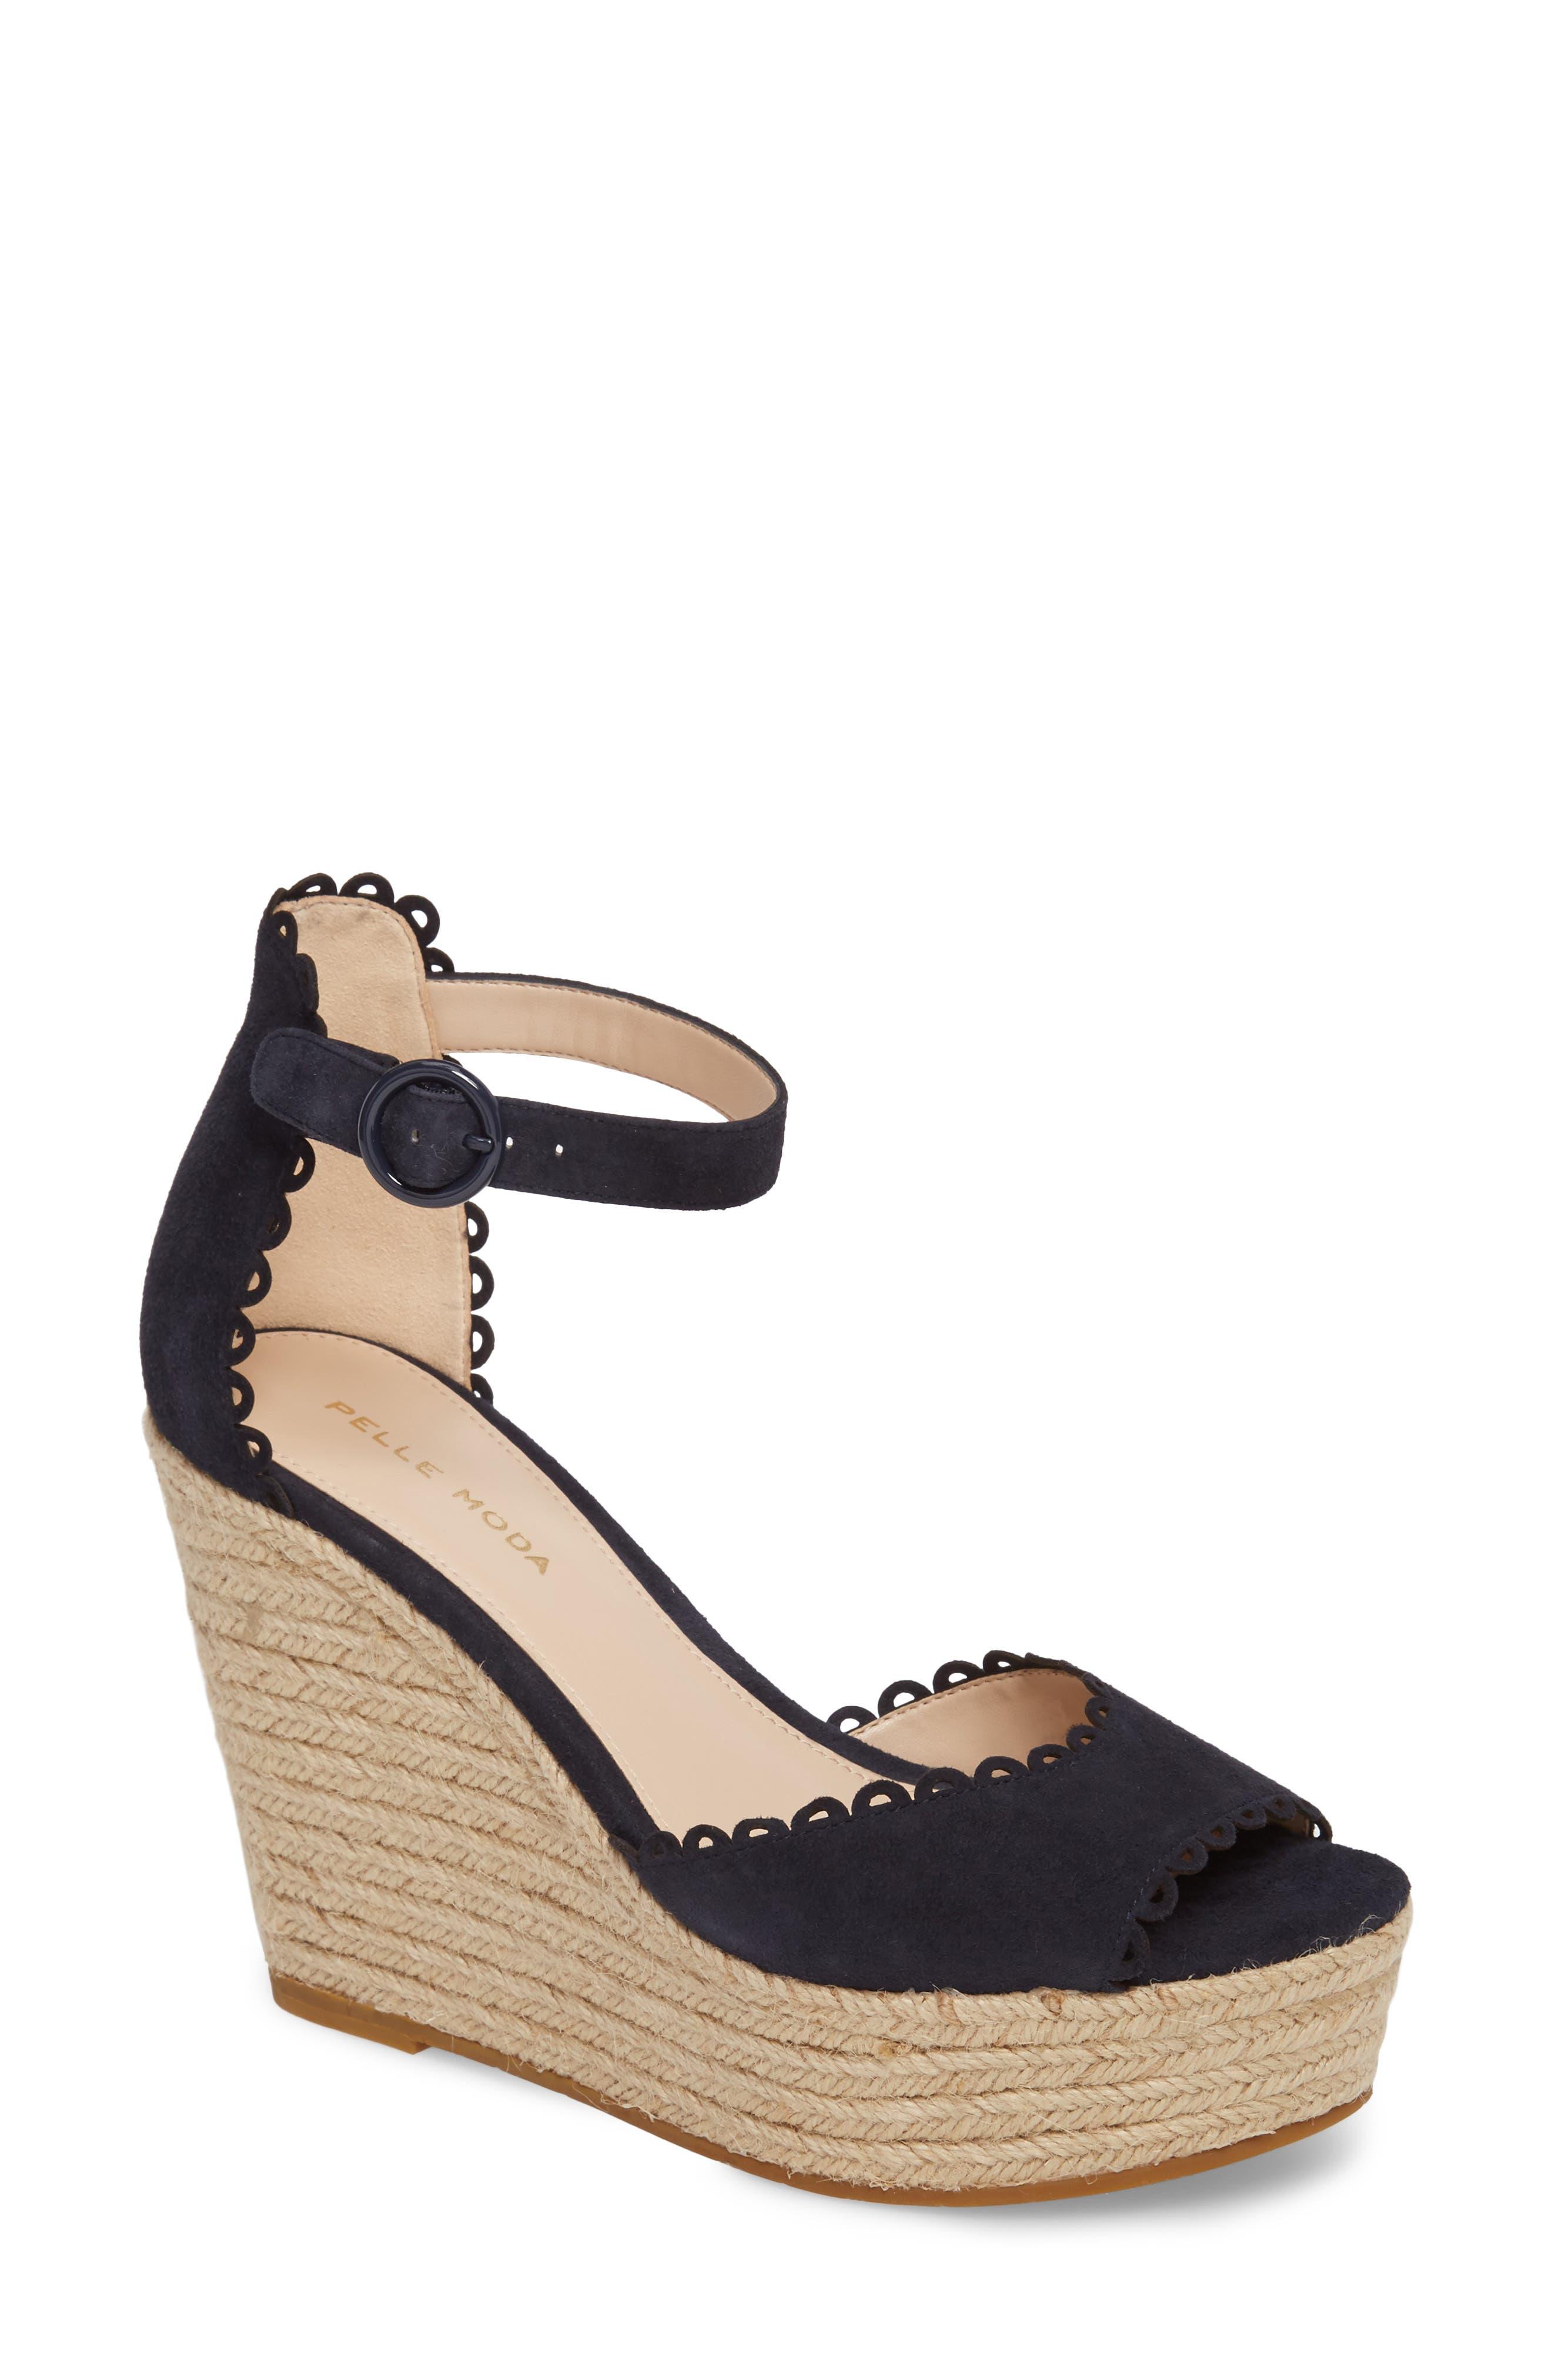 Pelle Moda Raine Platform Espadrille Sandal (Women)